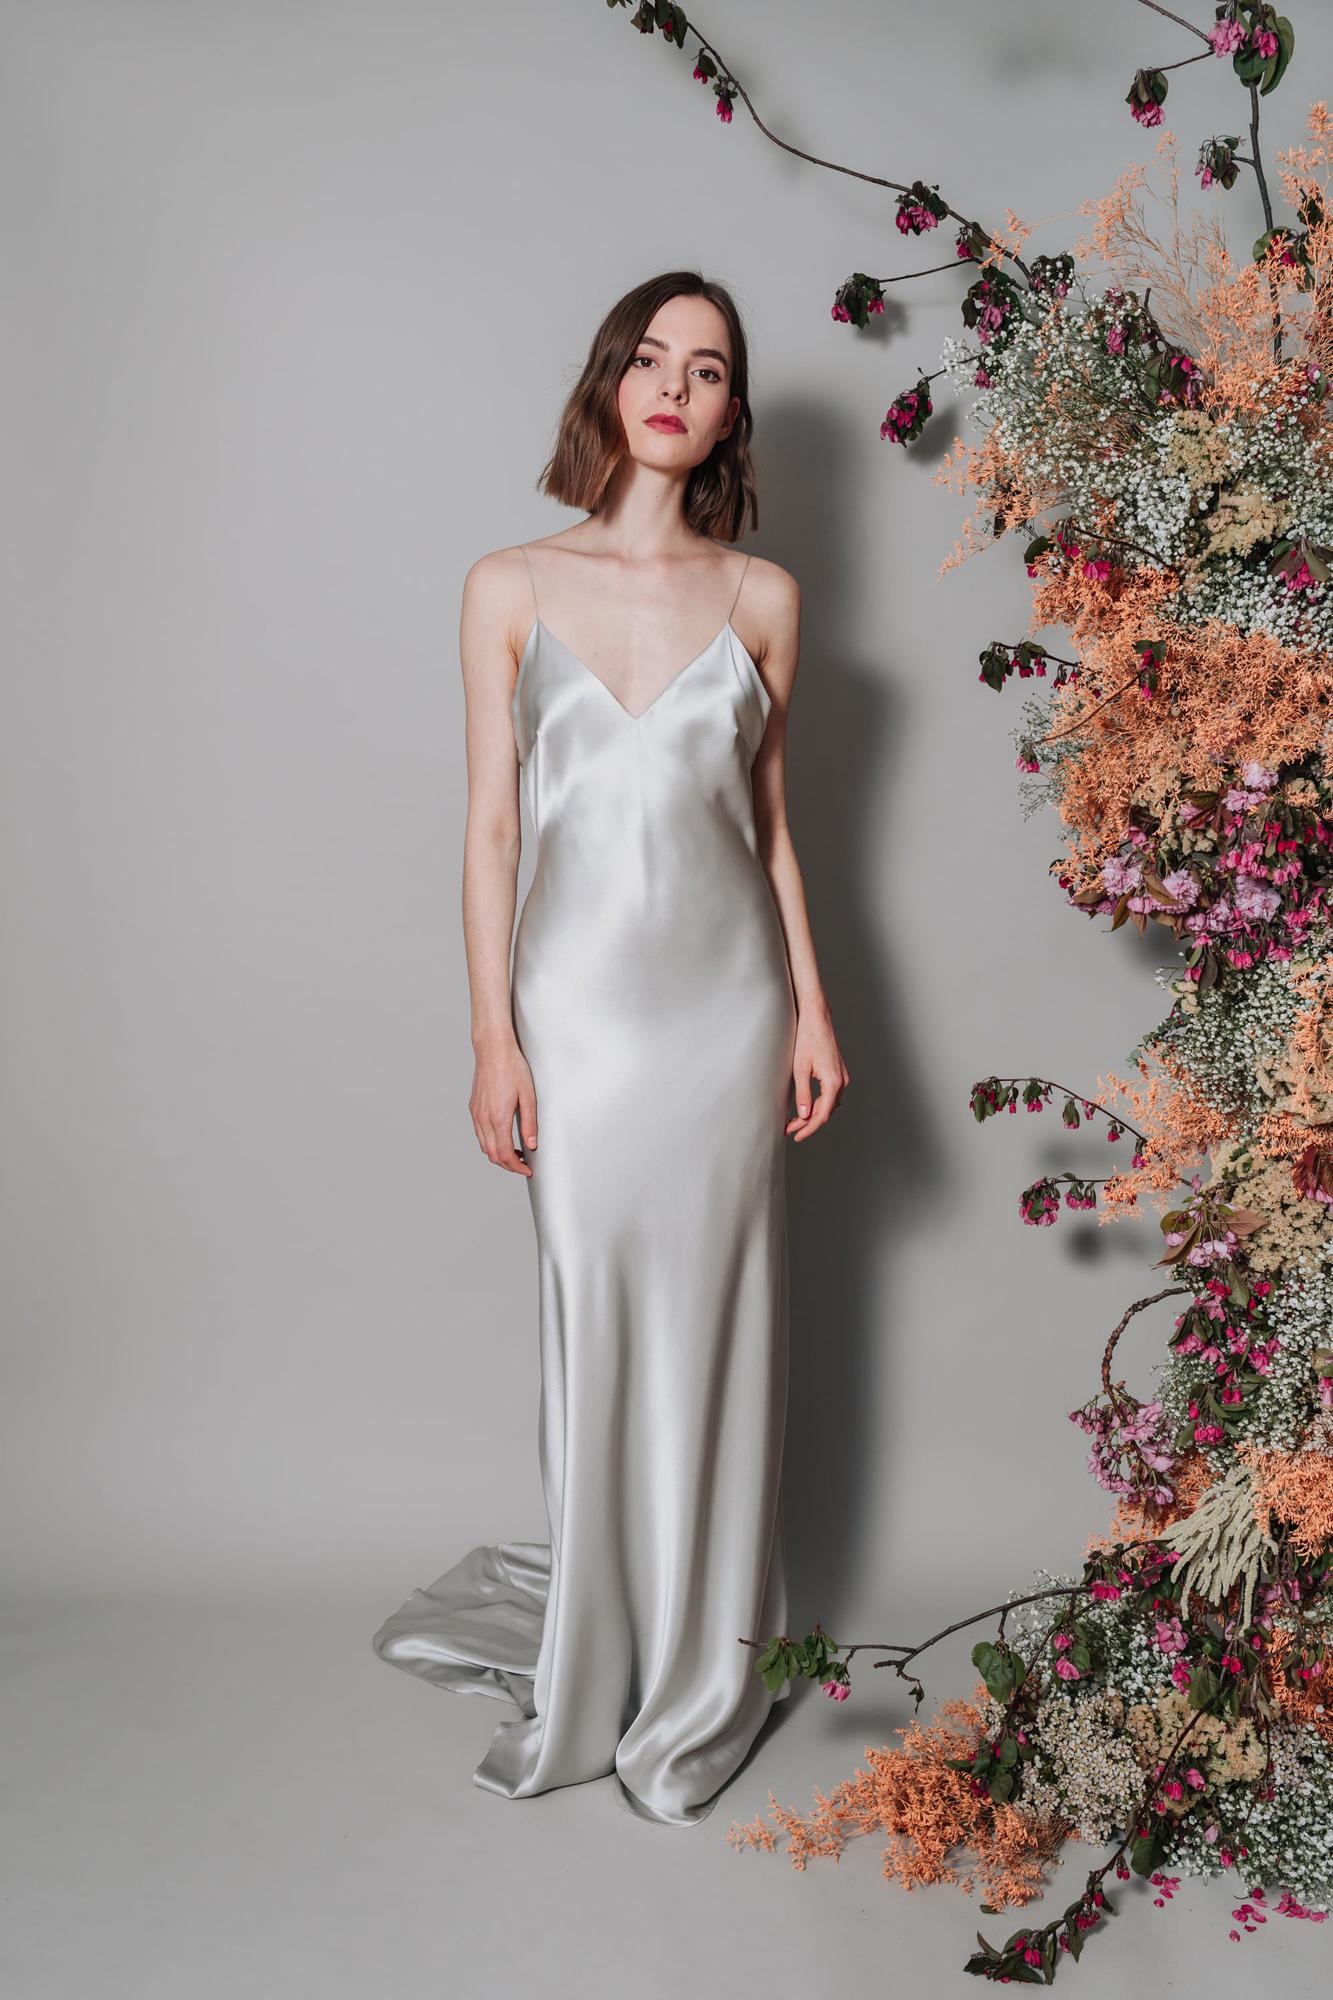 Kate-Beaumont-Sheffield-Cosmos-Minimal-Modern-Silver-Silk-Slip-Wedding-Dress-2.jpg